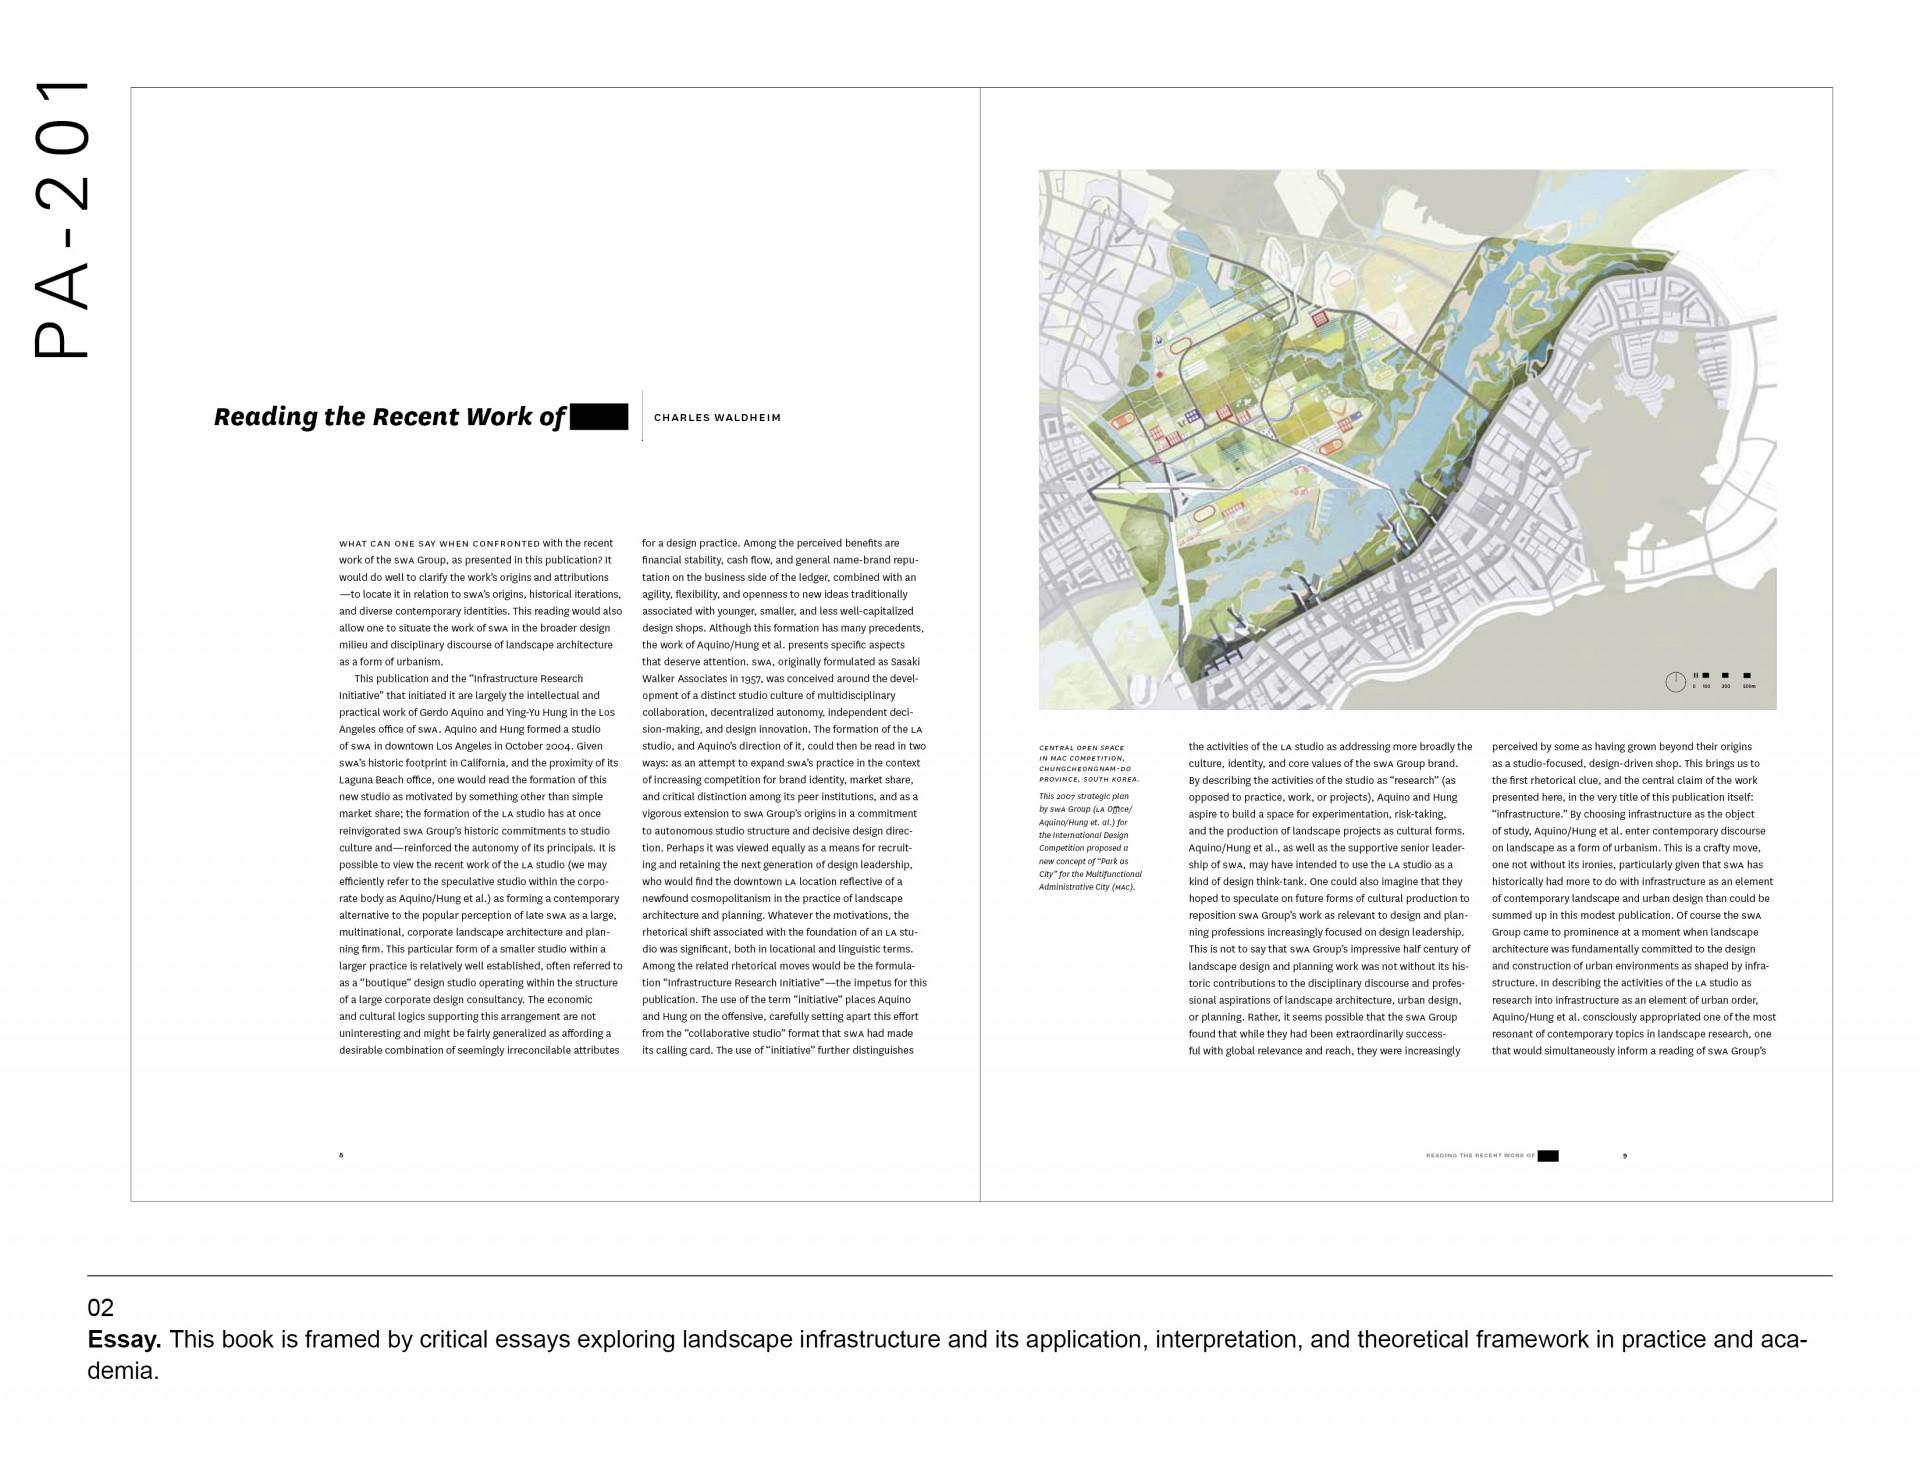 003 Landscape Architecture Essay Example 201 02 Stunning Argumentative Topics 1920